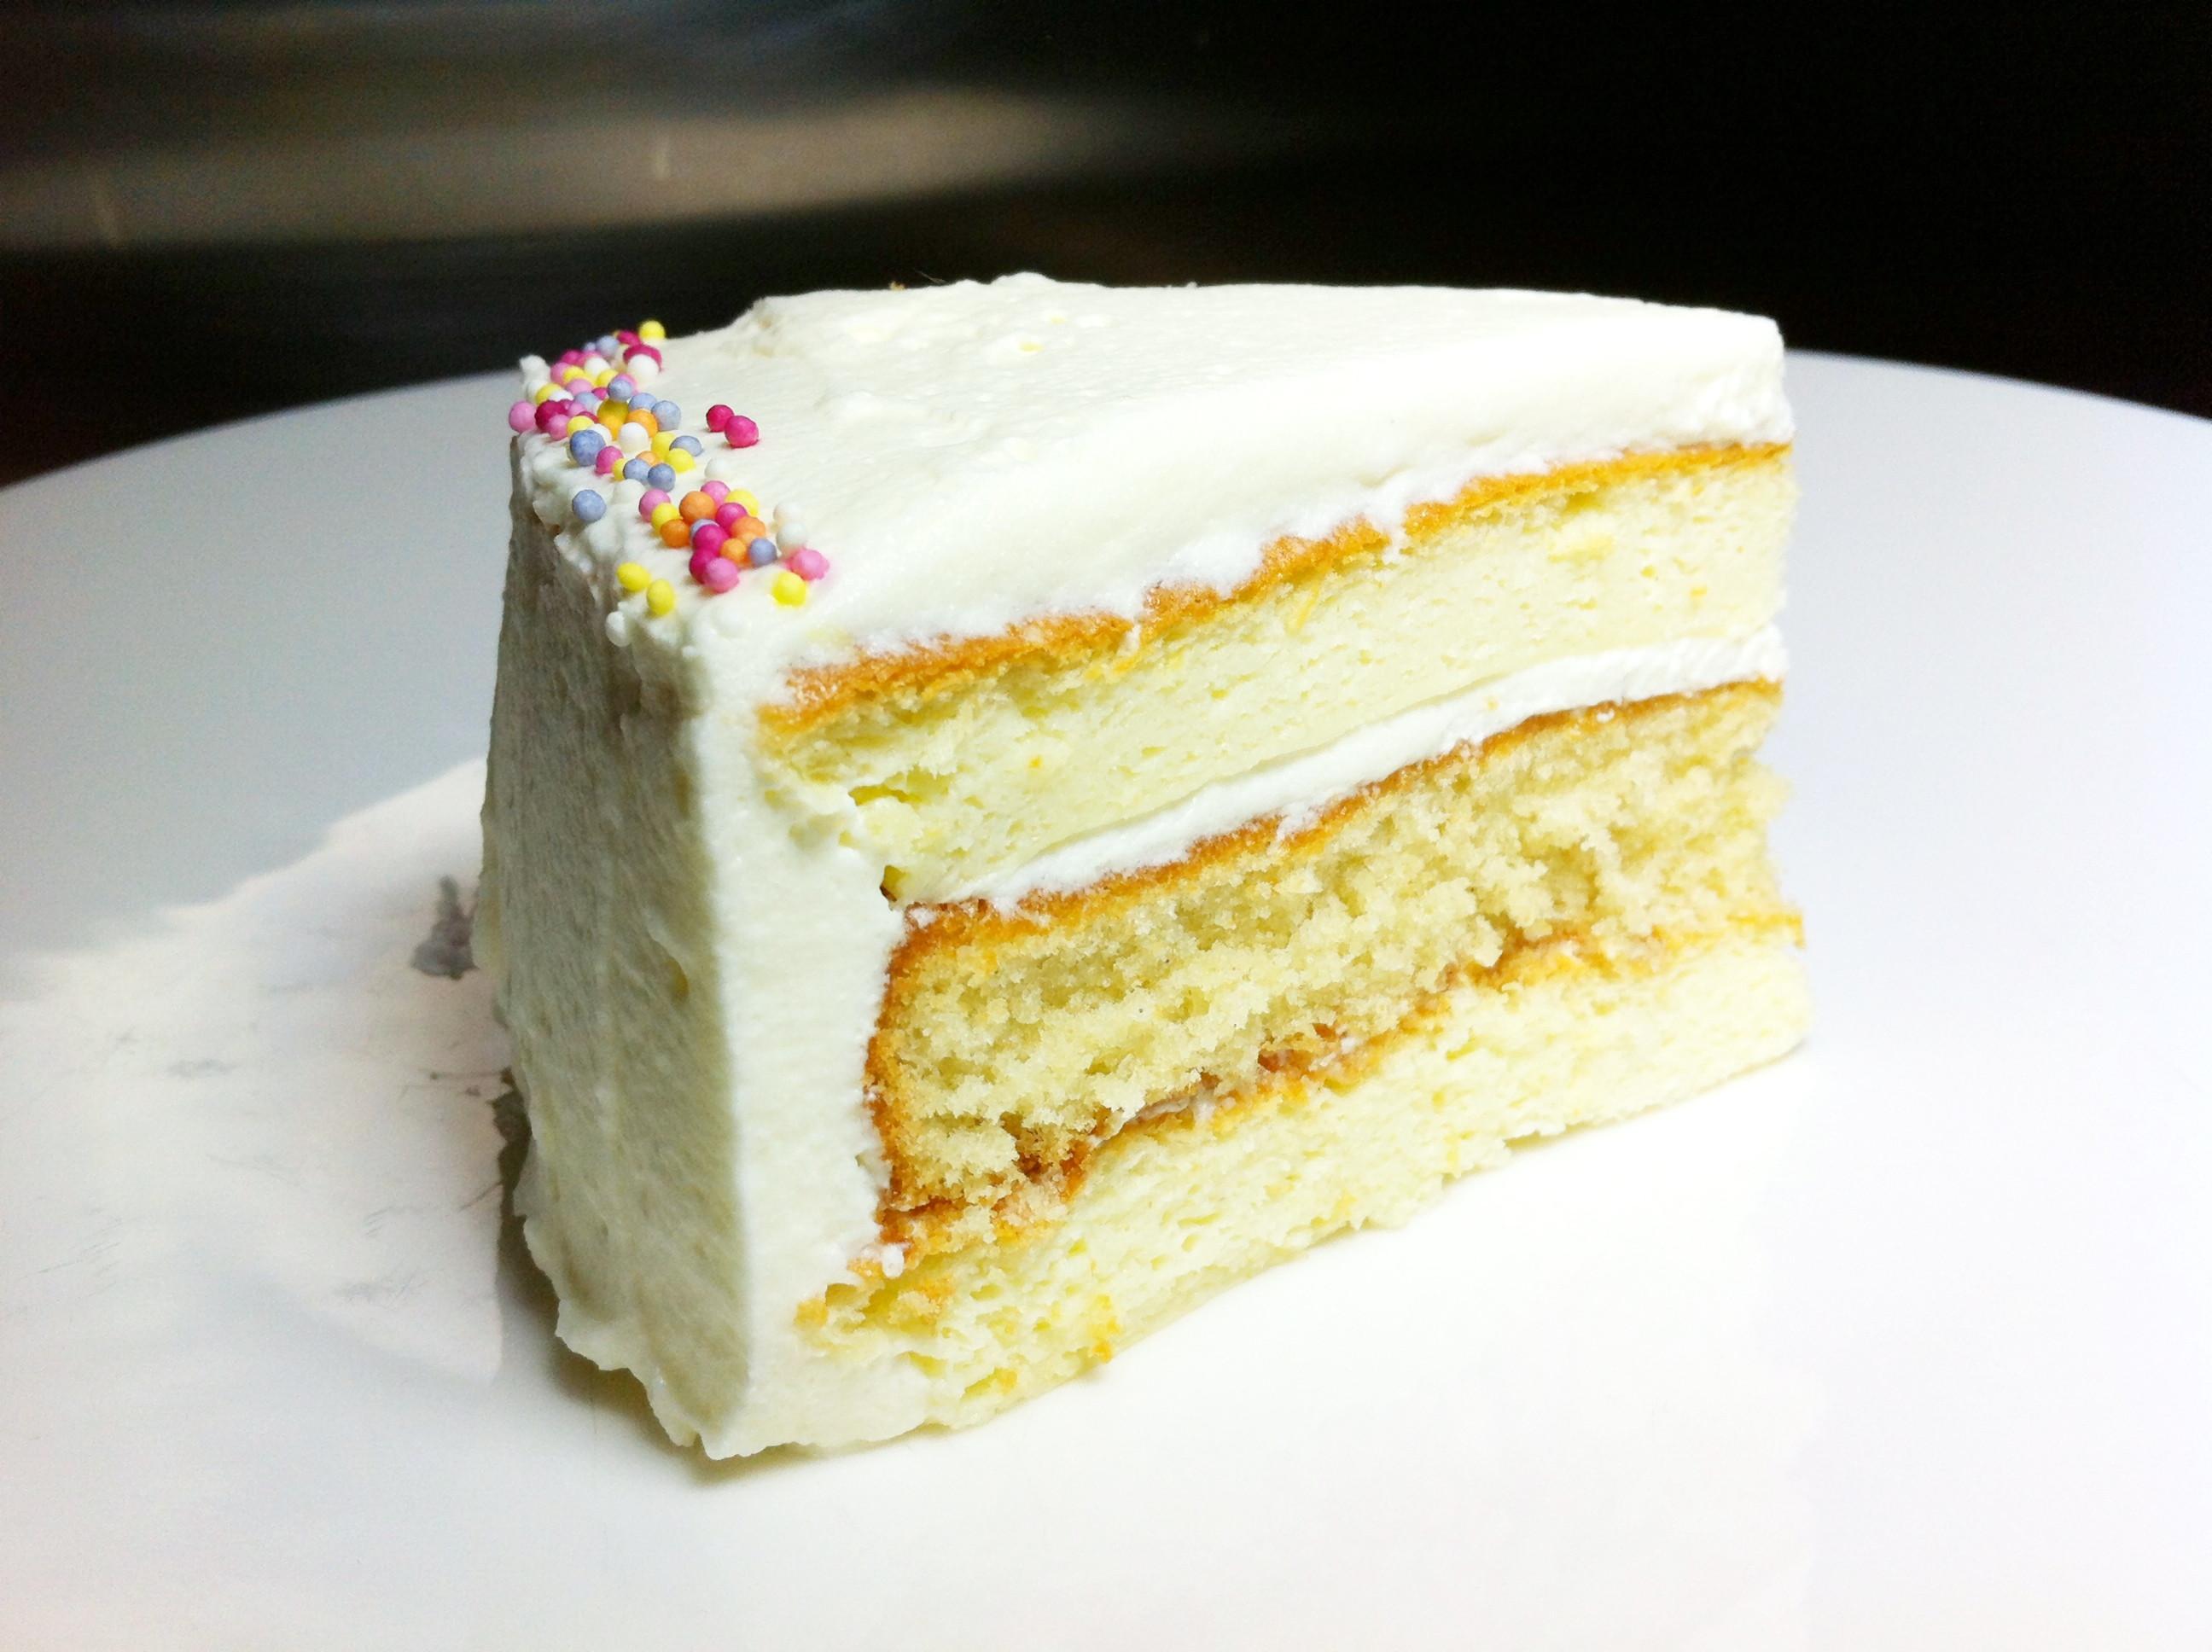 Japanese Sponge Cake Recipe  East meets West A Japanese cheesecake and sponge layered